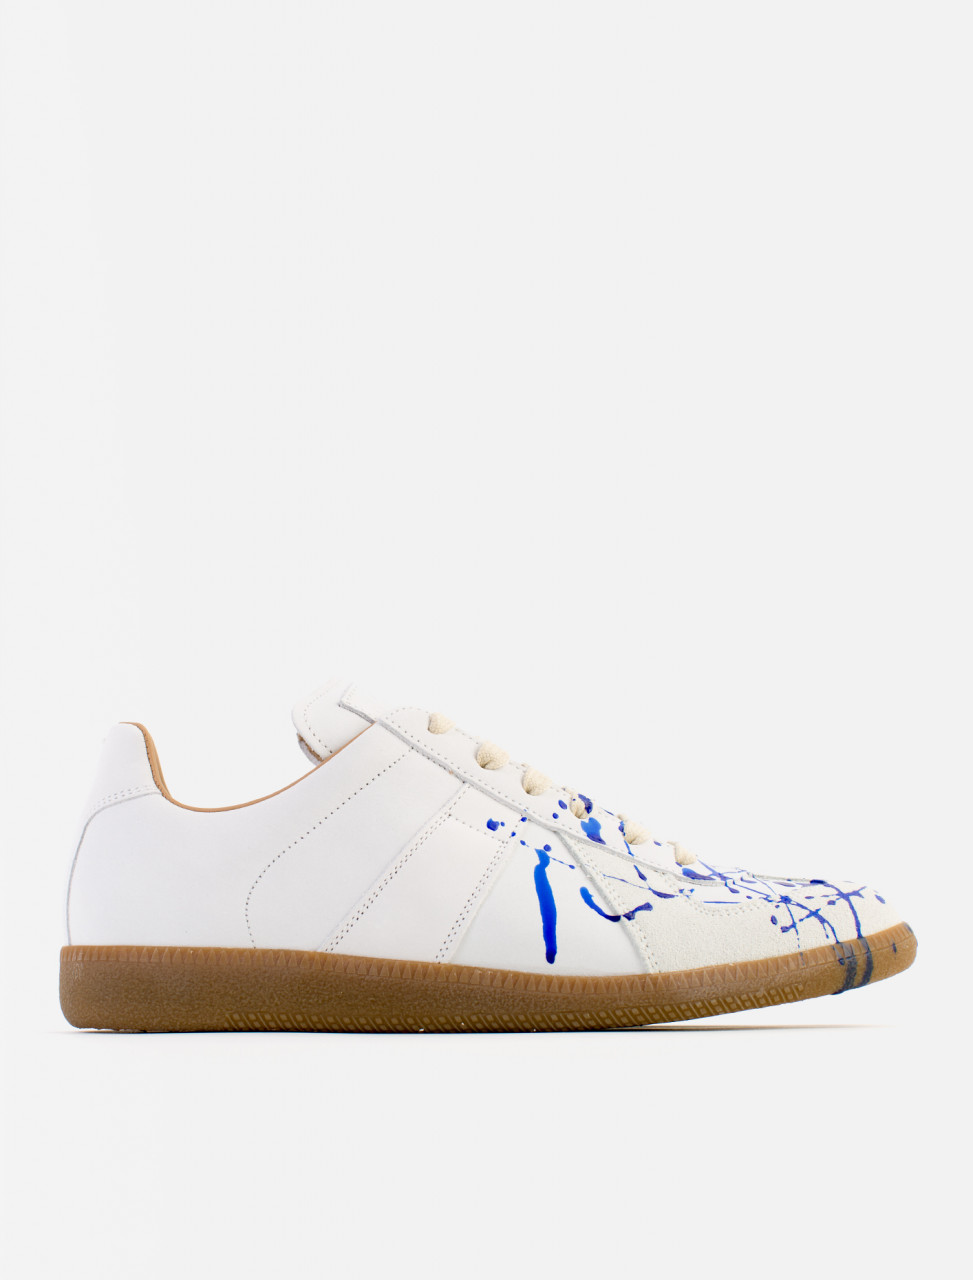 Replica Paint Drops Sneaker